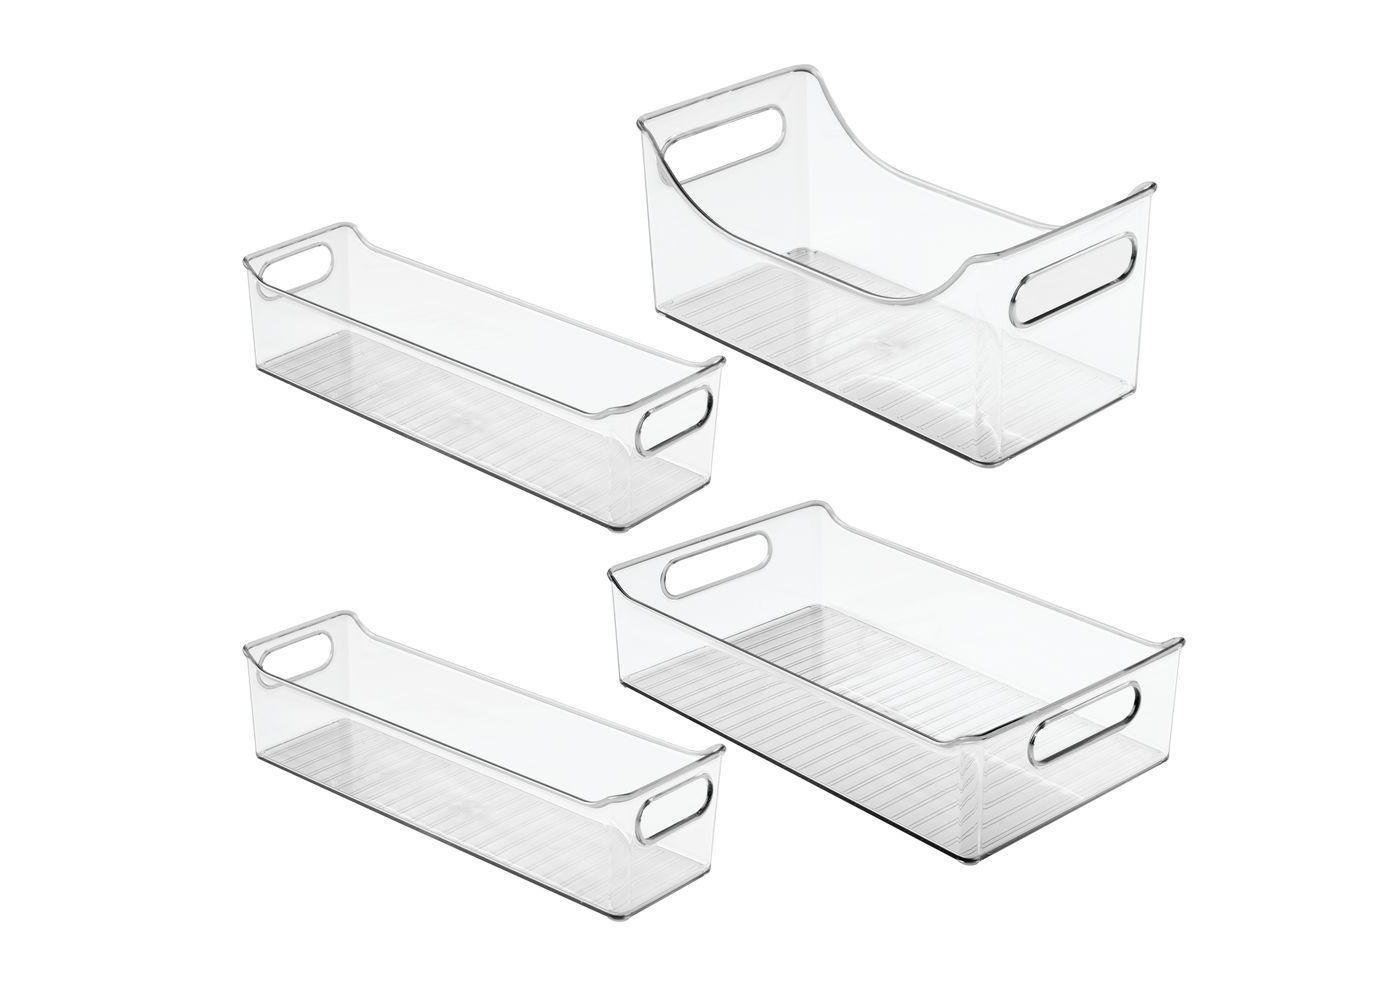 https://www.target.com/p/mdesign-wide-plastic-kitchen-pantry-cabinet-food-storage-bin-2-pack/-/A-79359622?preselect=78619251#lnk=sametab